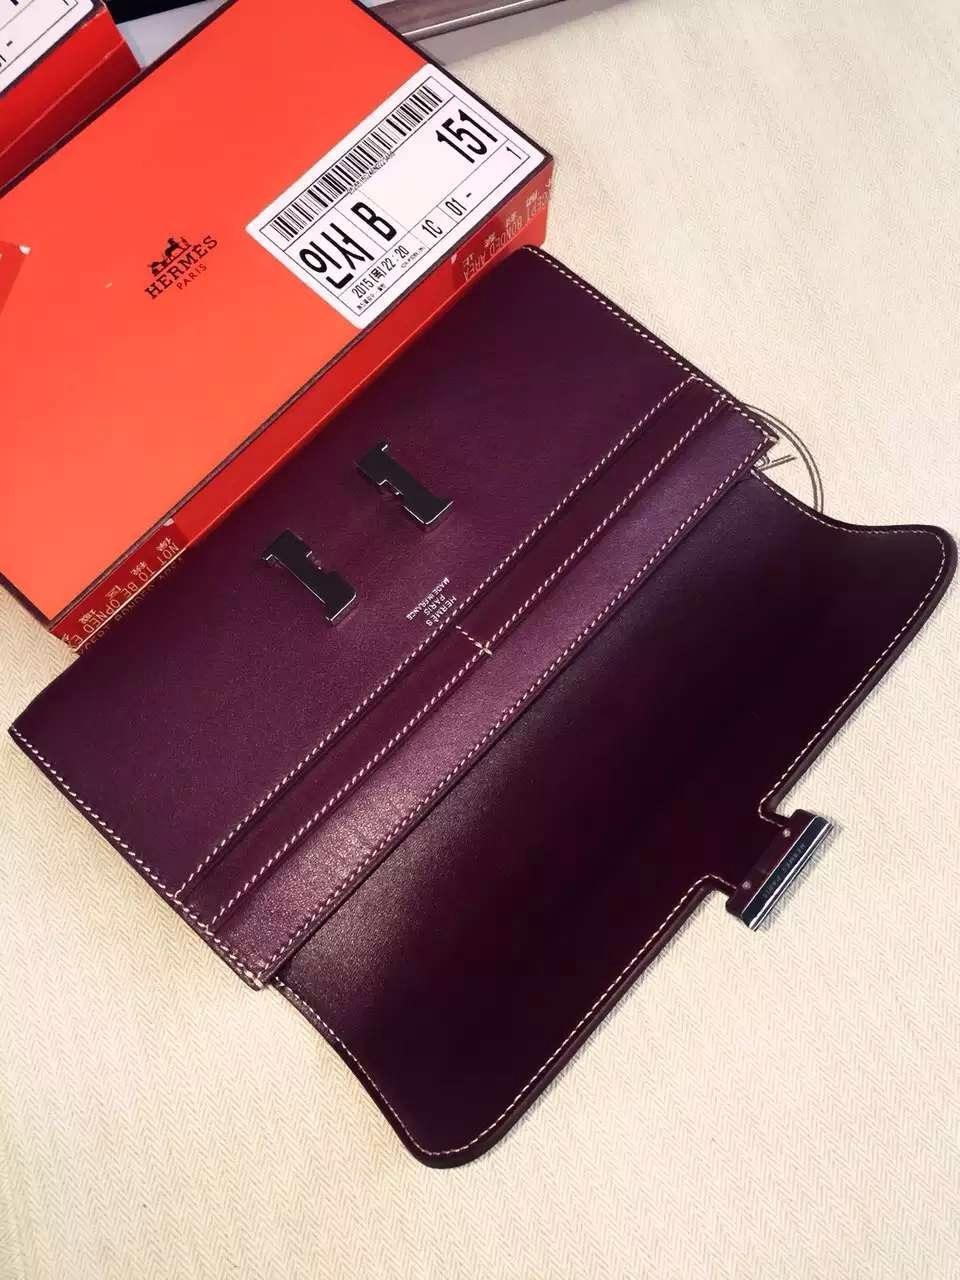 21CM Hermes Bordeaux Swift Leather Constance Women's Long Wallet Clutch Handbag